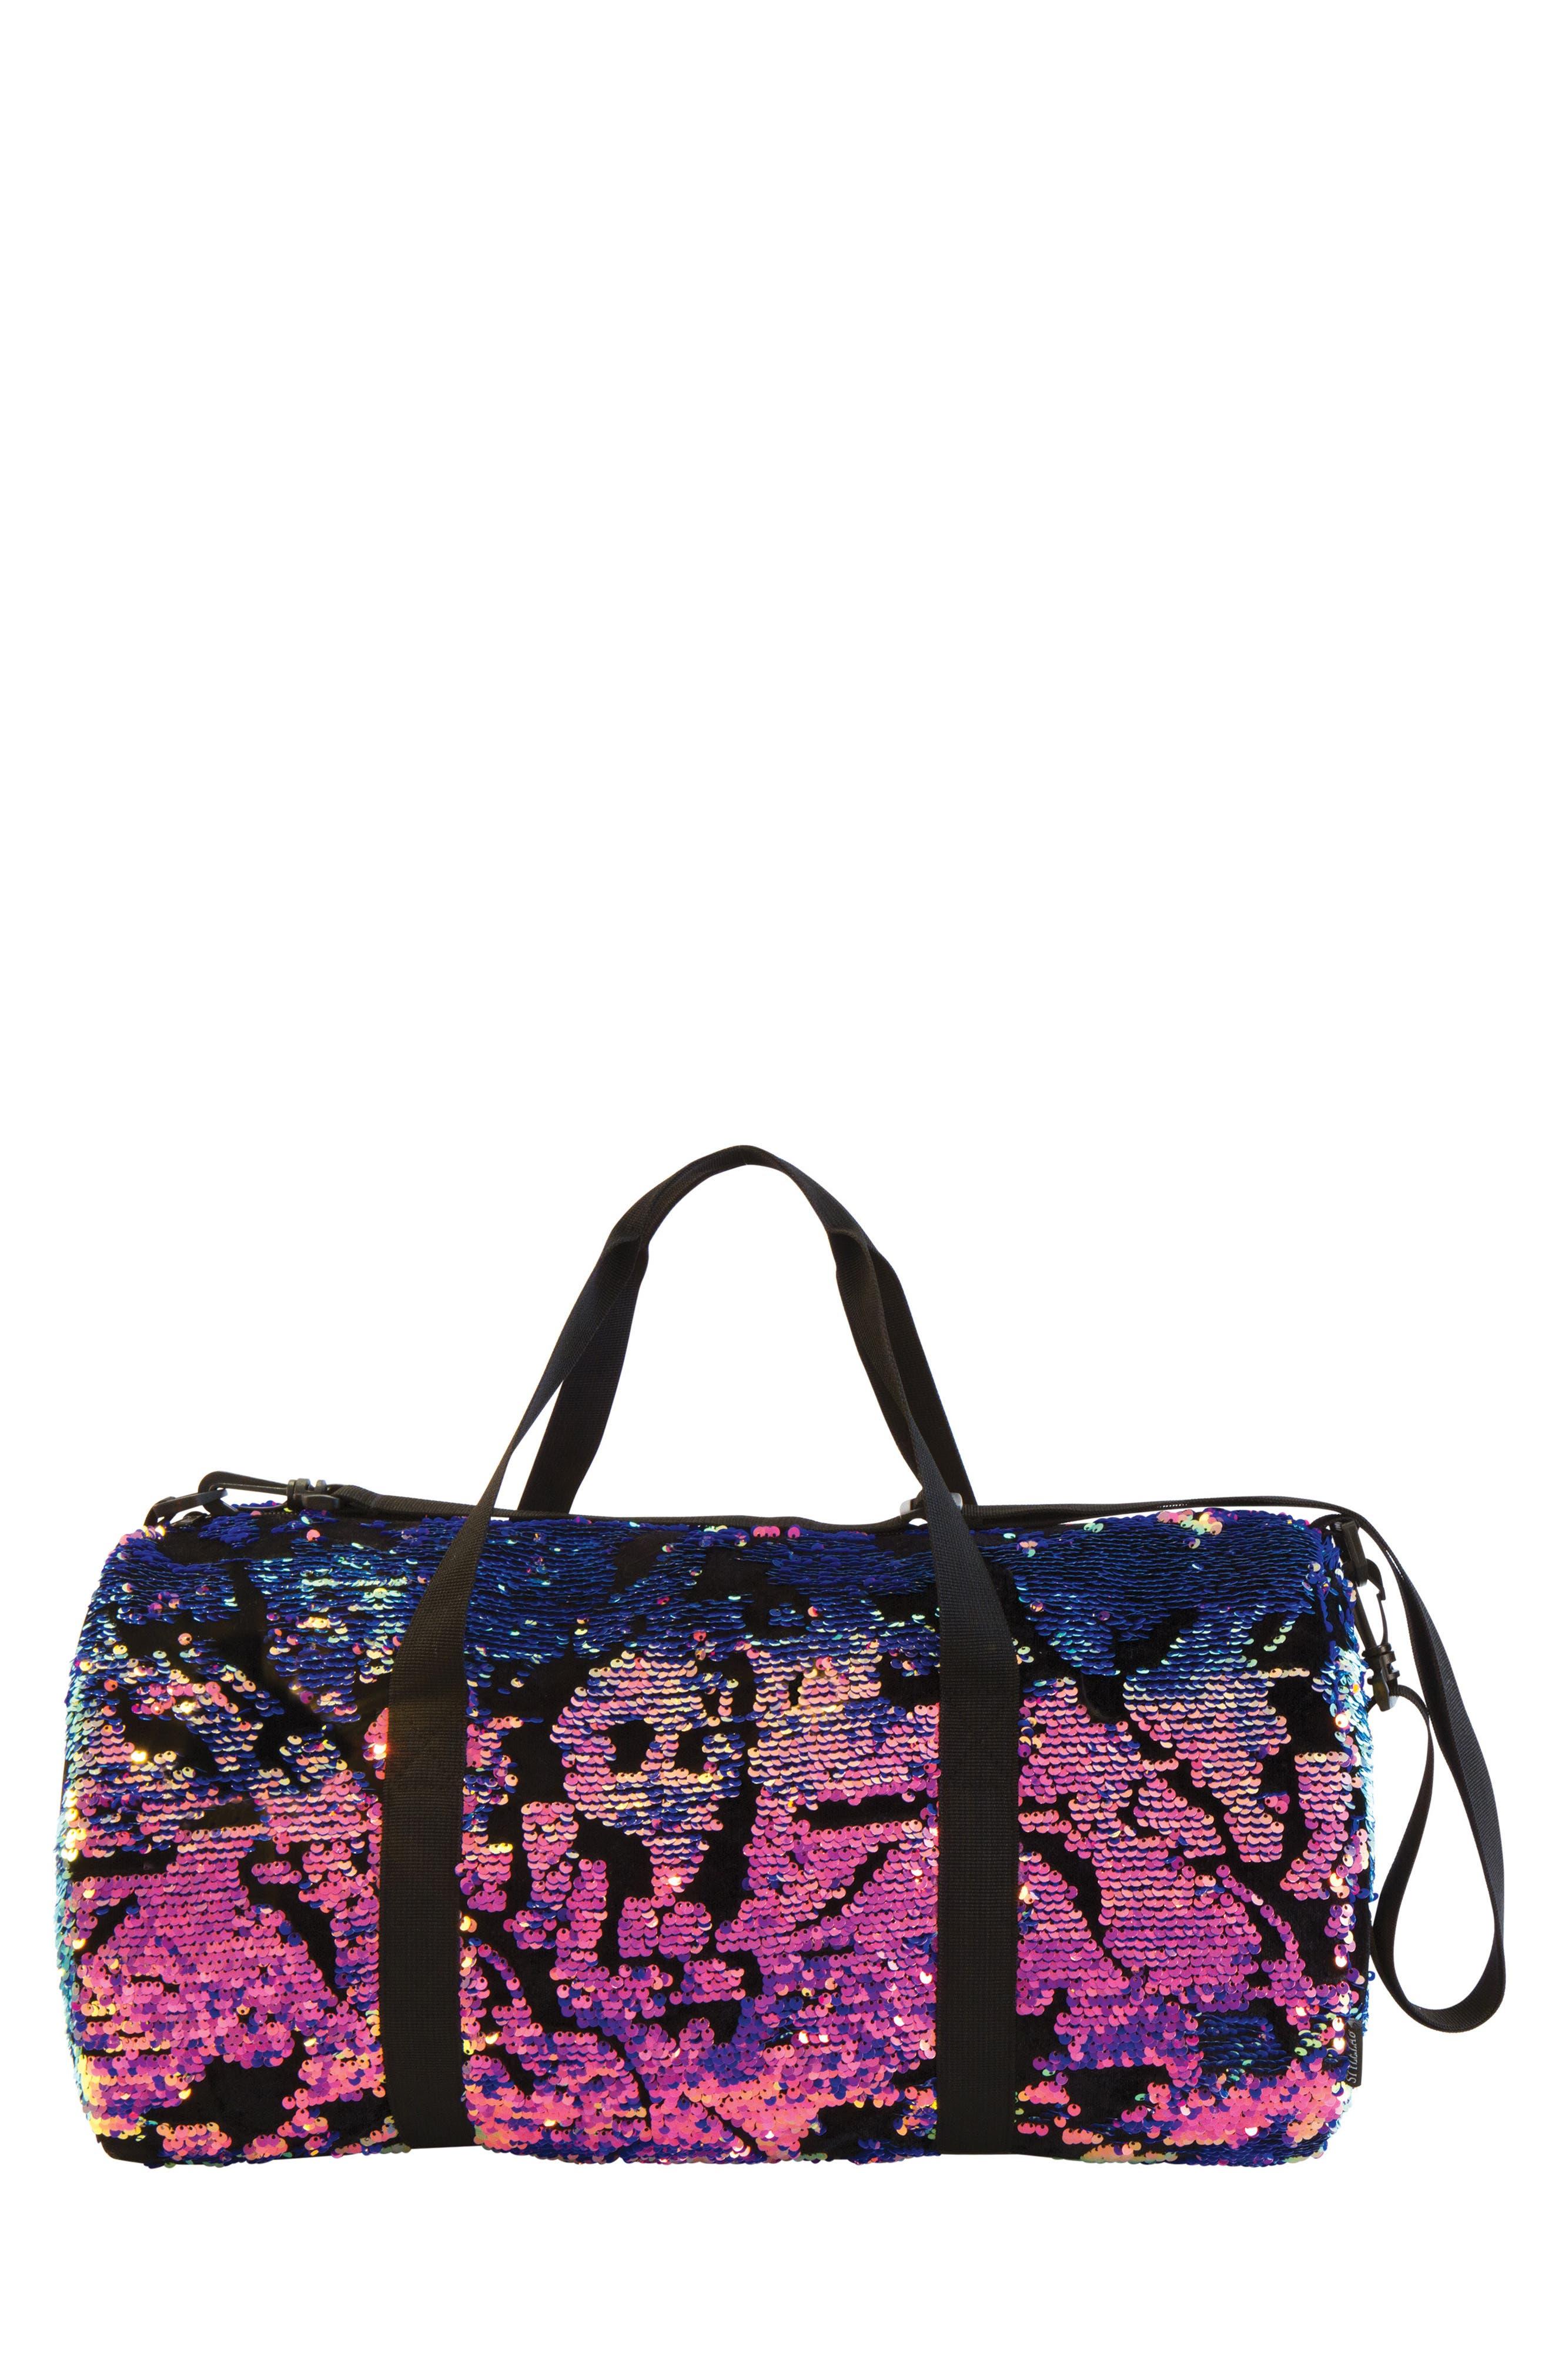 Girls Fashion Angels Magic Sequin  Velvet Duffel Bag